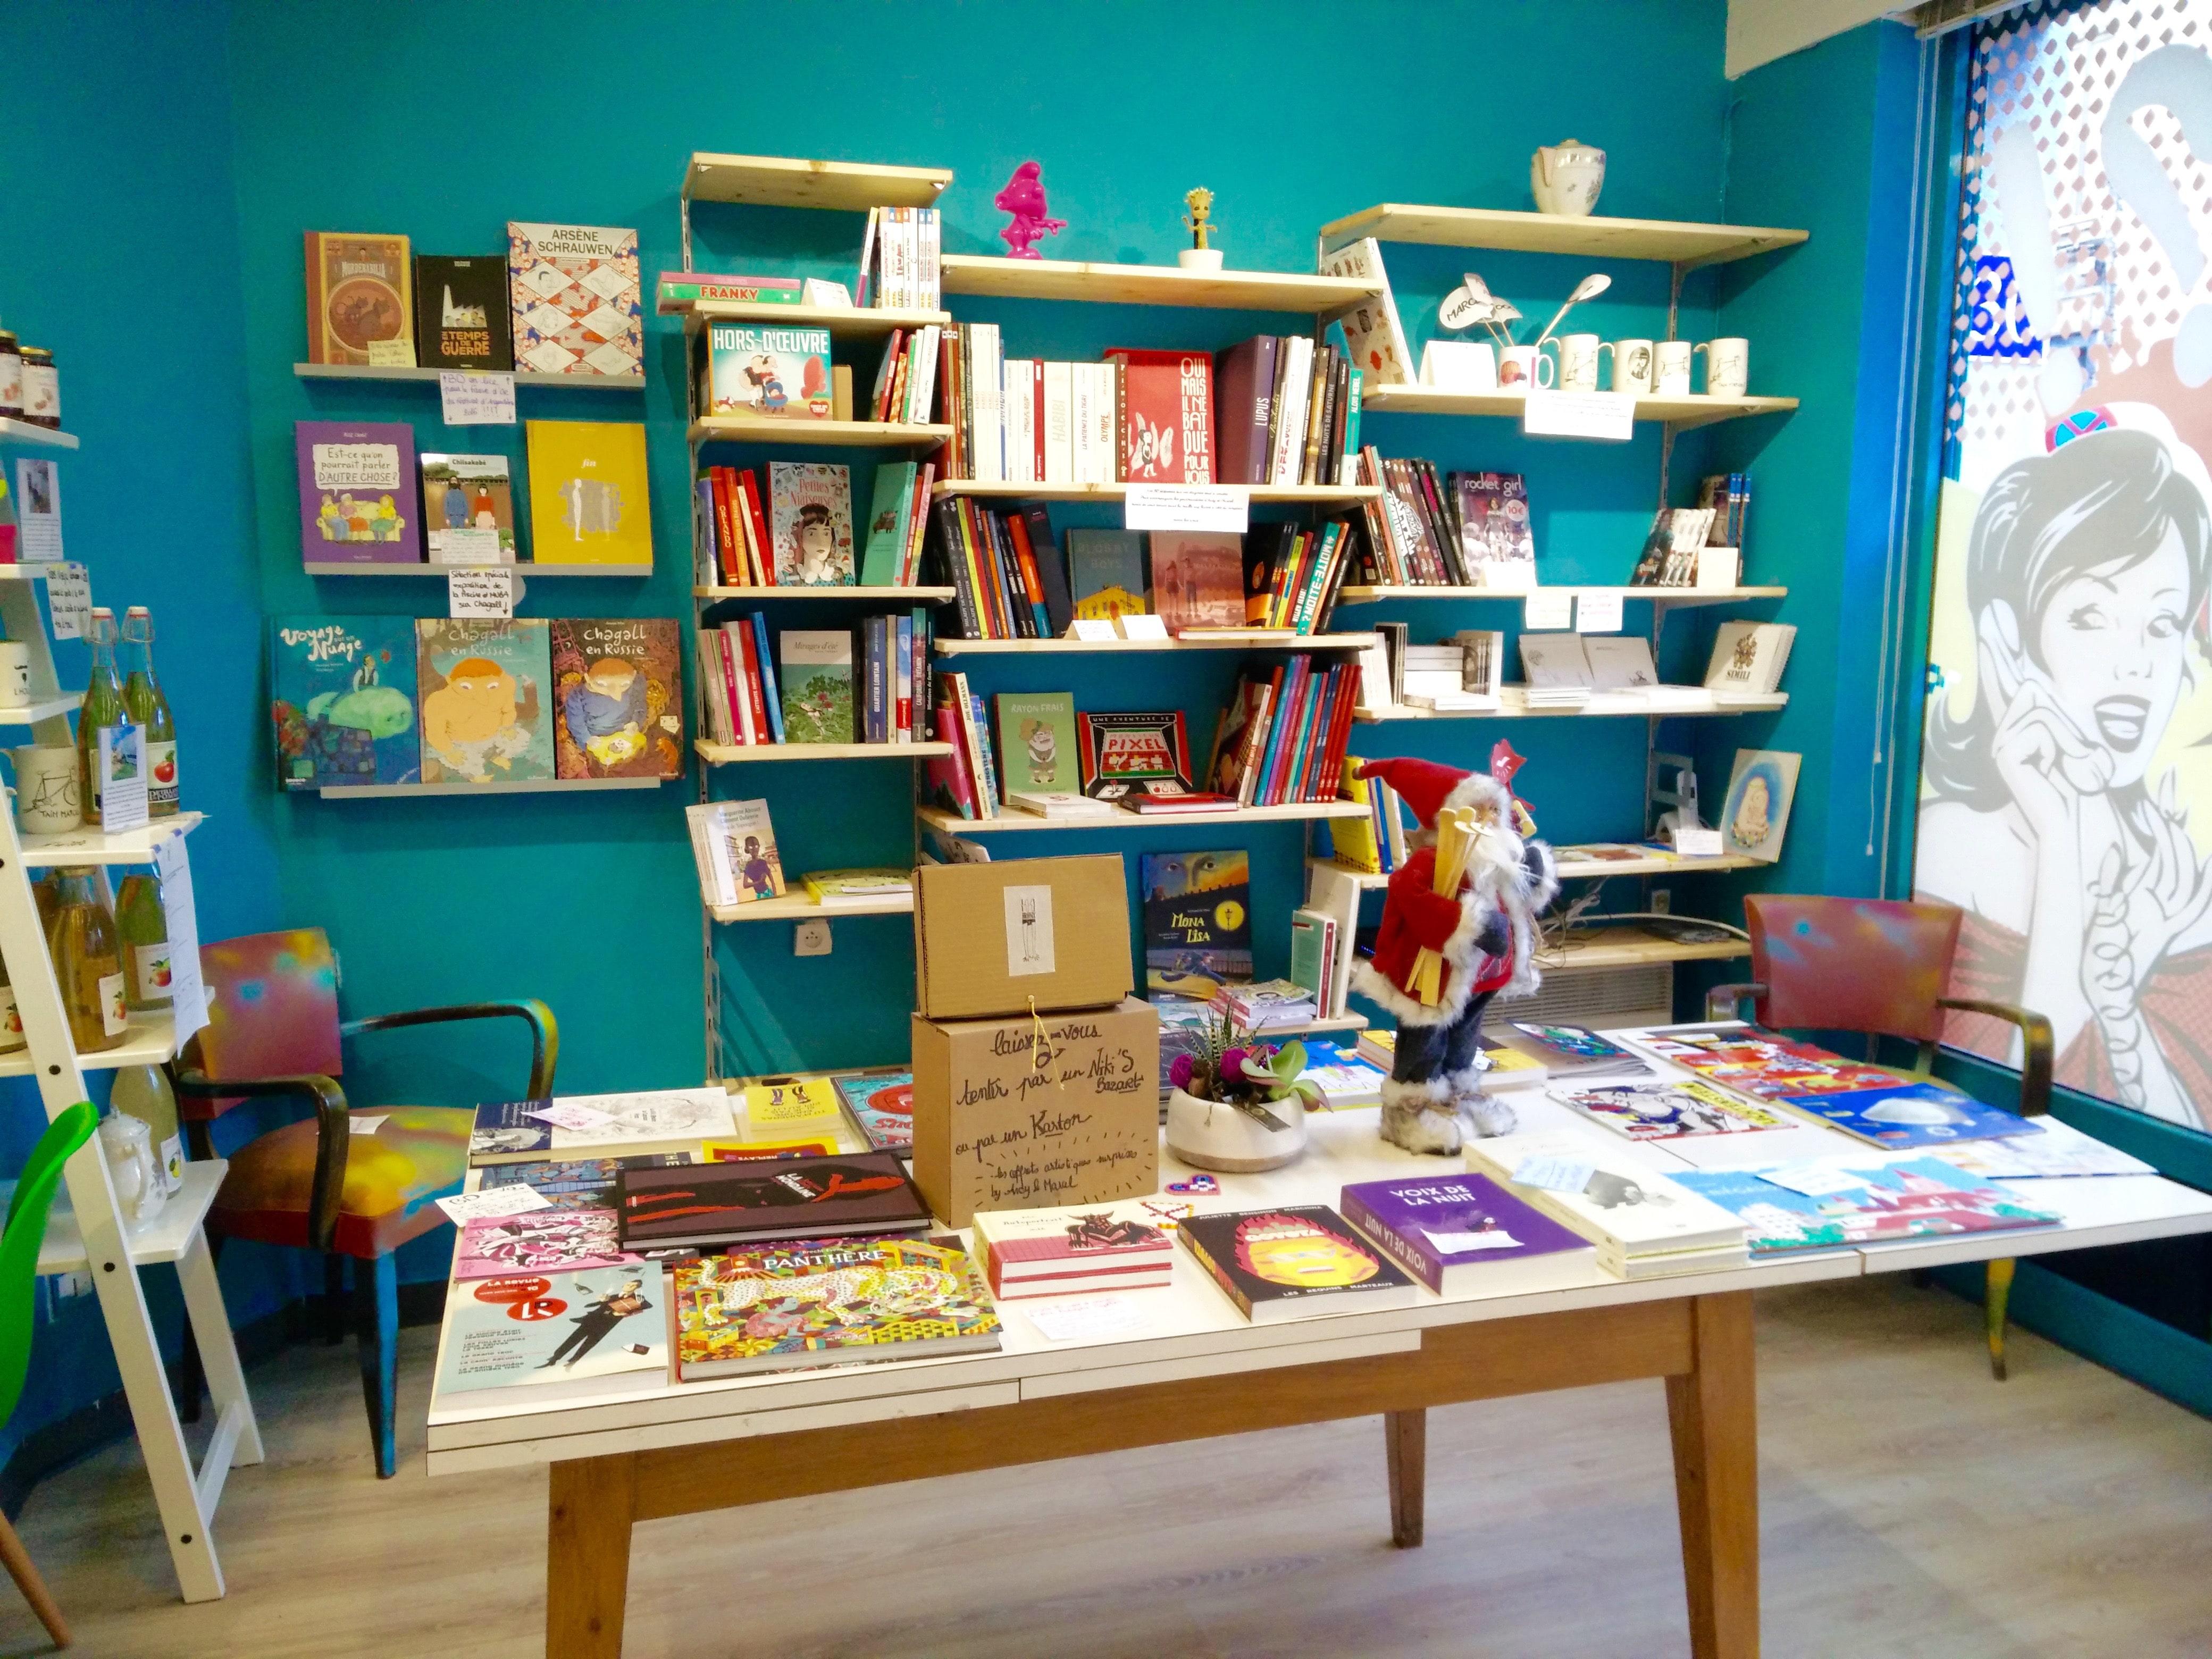 Andy marcel librairie bd salon de th lille chicon - Librairie salon de the ...